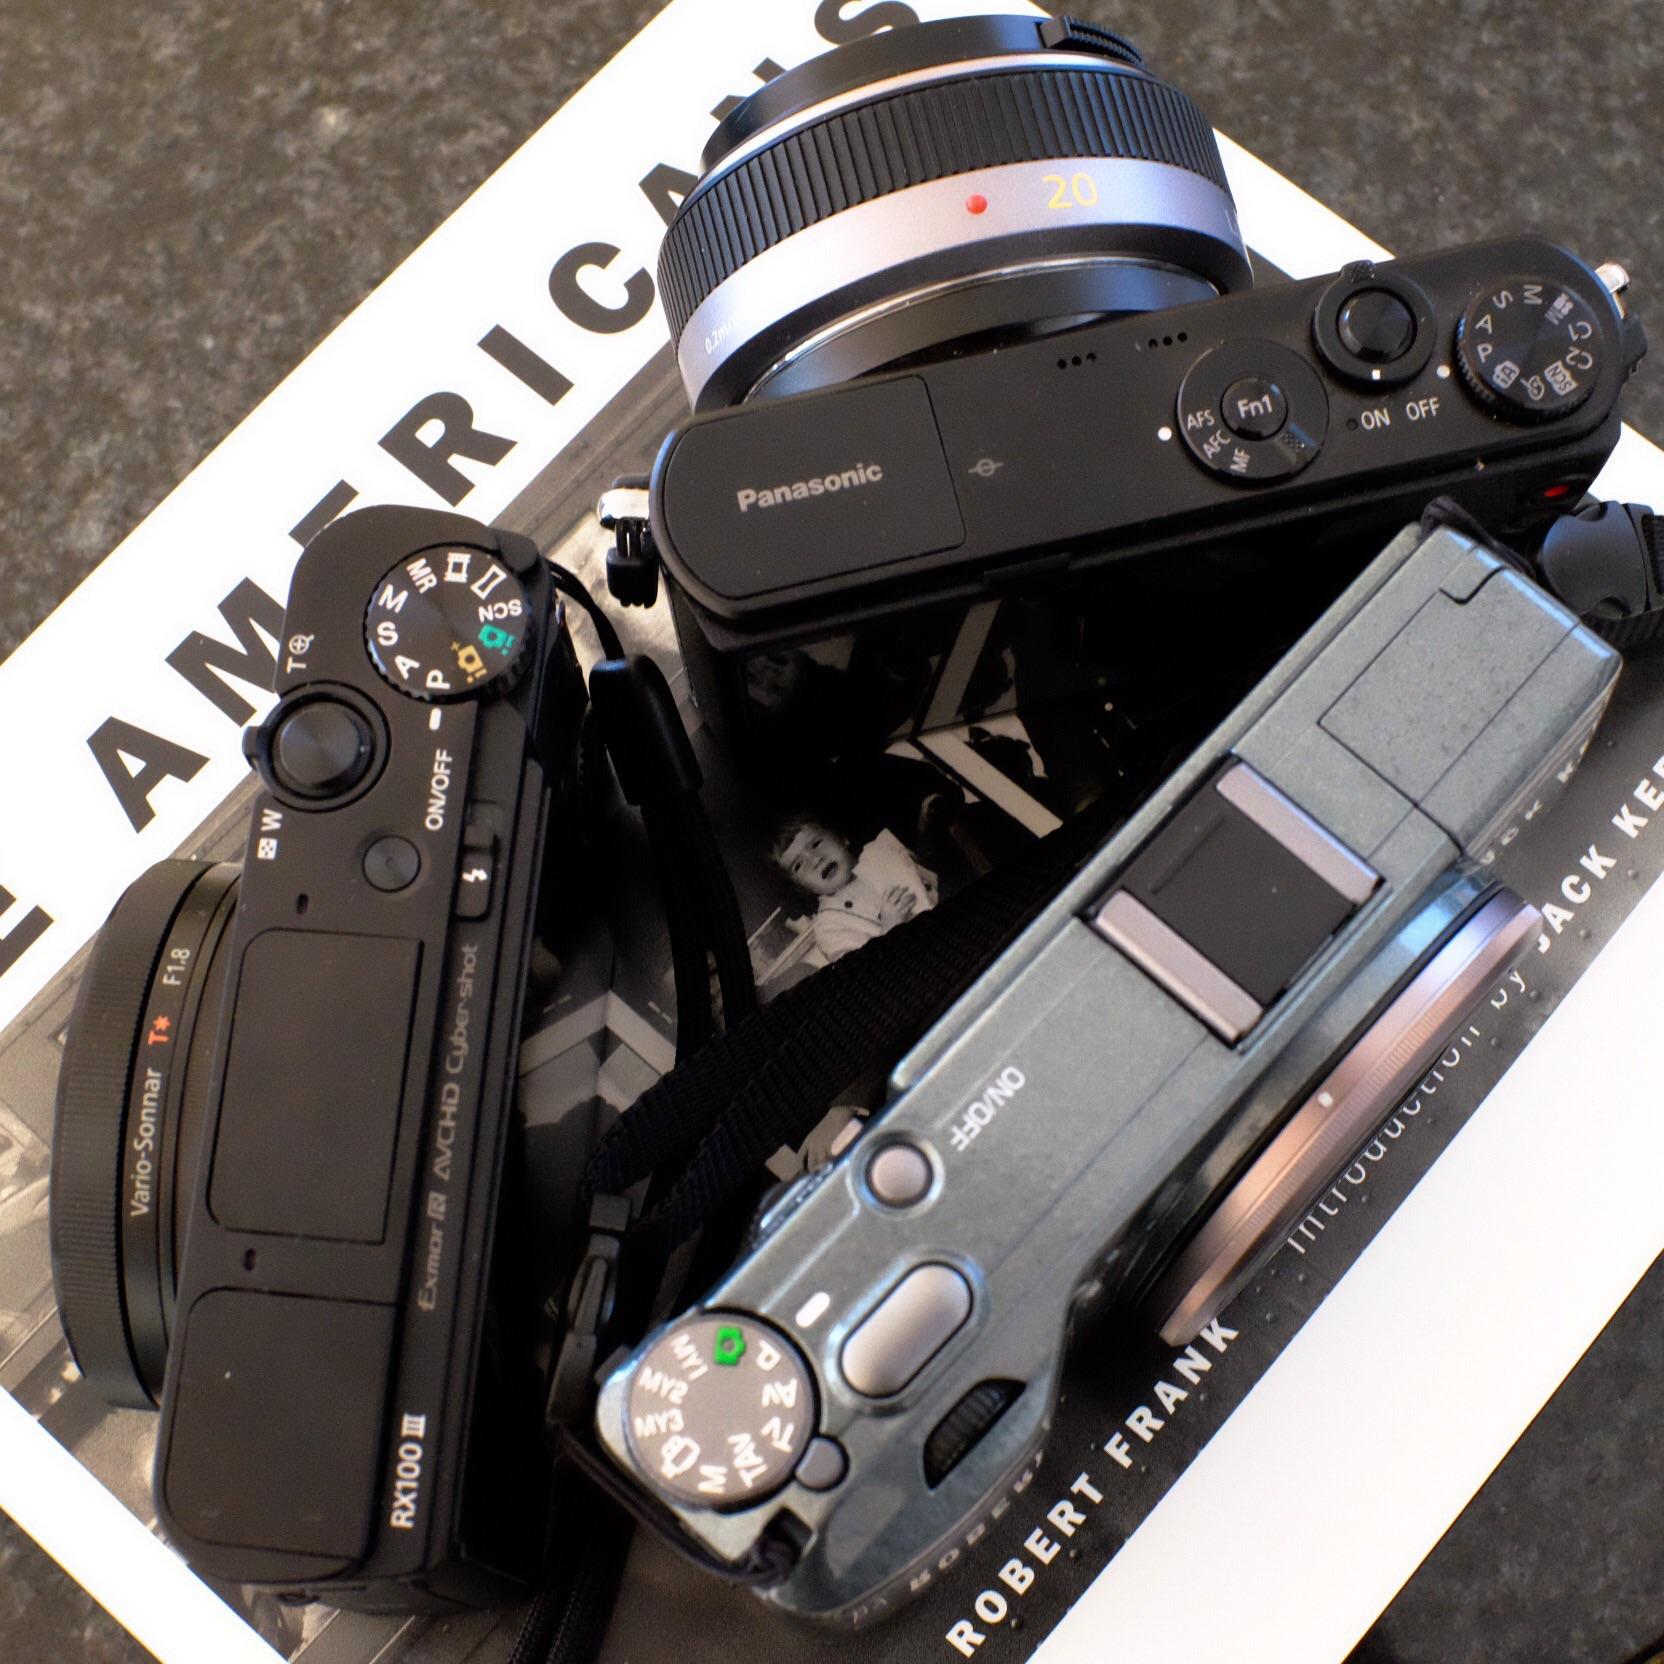 Sony RX100M3 Panasonic GM-1 Ricoh